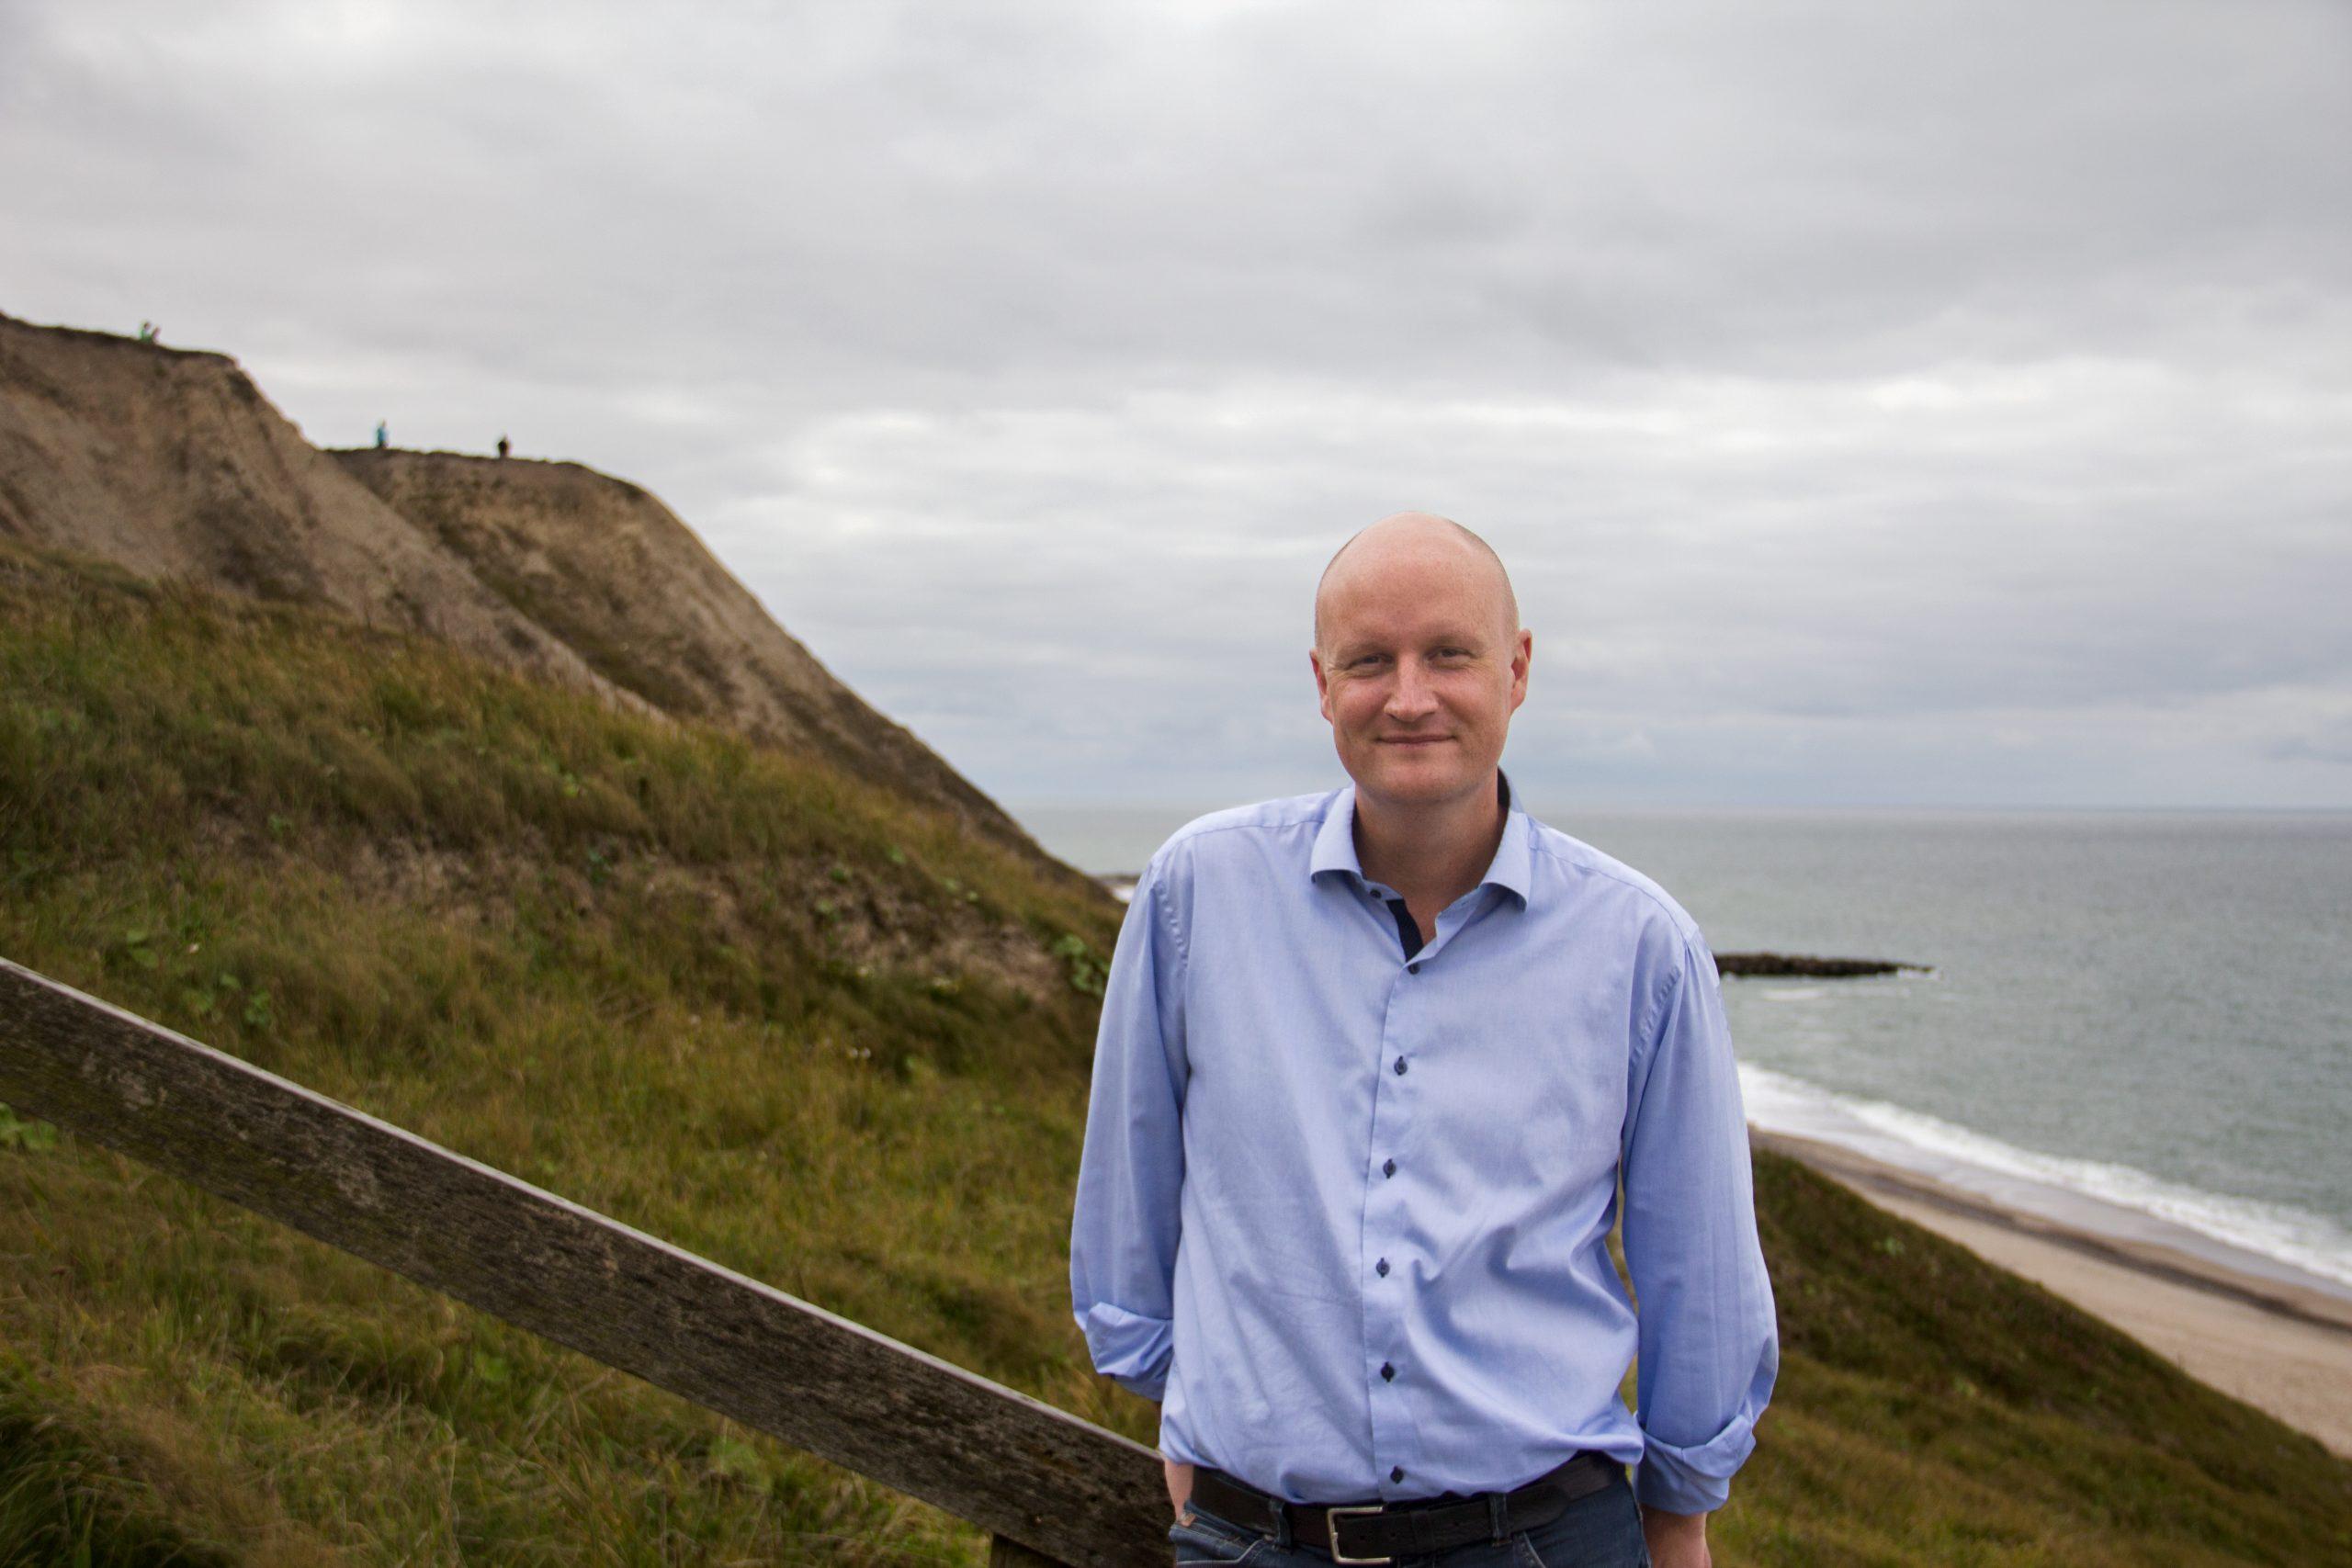 Turistchef i Lemvig-Thyborøn Turistforening, Kristian Hansen. (Pr-foto)